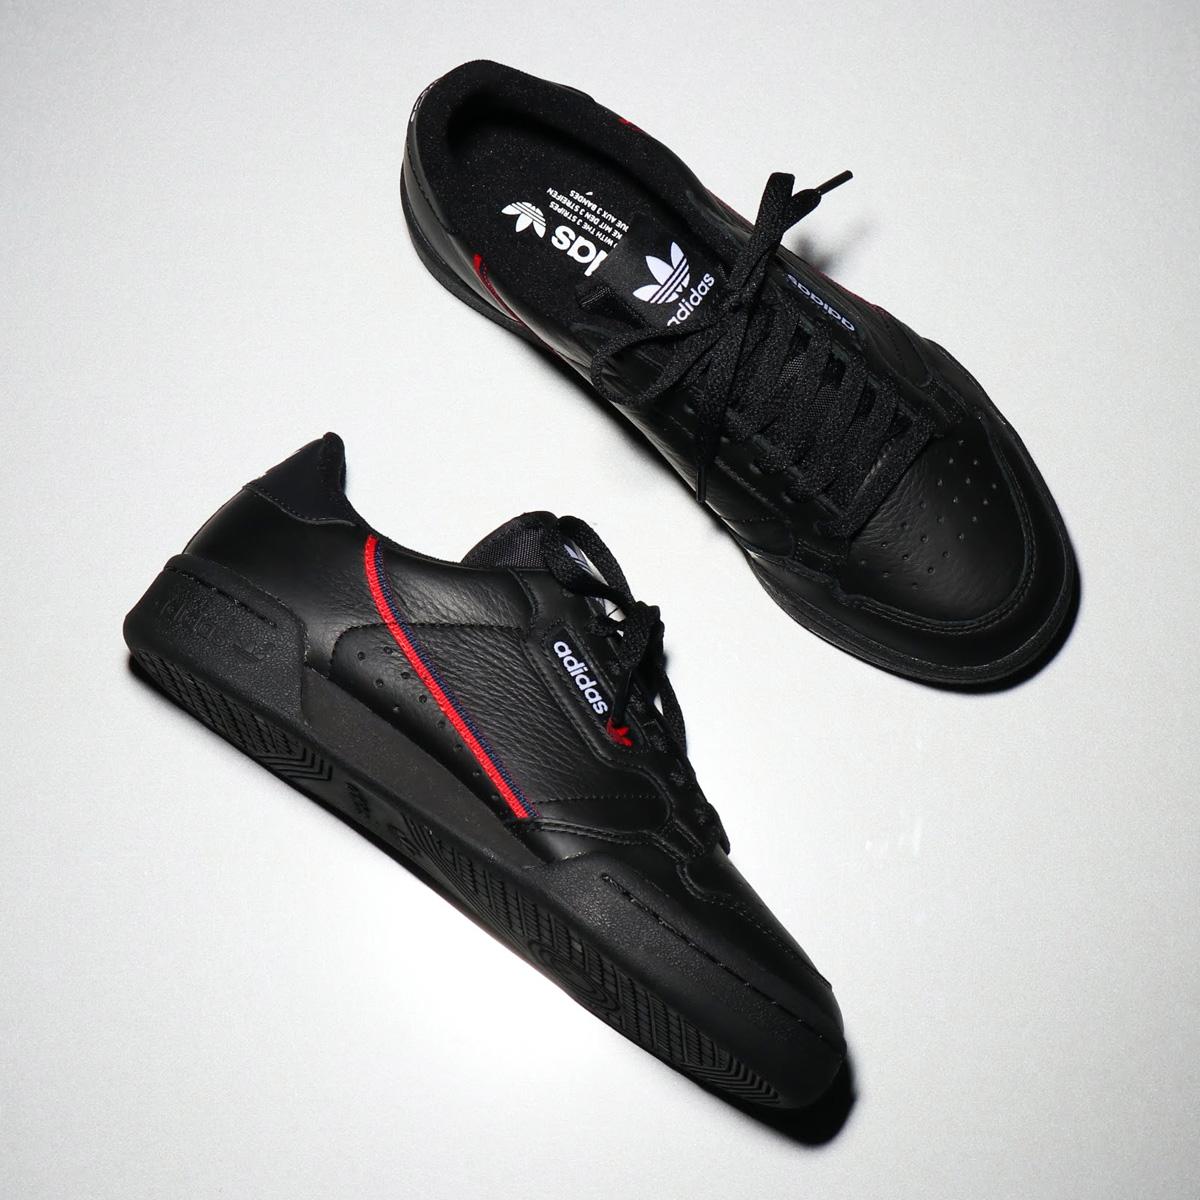 adidas Originals CONTINENTAL 80 (Adidas originals Continental 80) CORE BLACK  SCARLET COLLEGIATE NAVY 18FW-I aec7e80a1